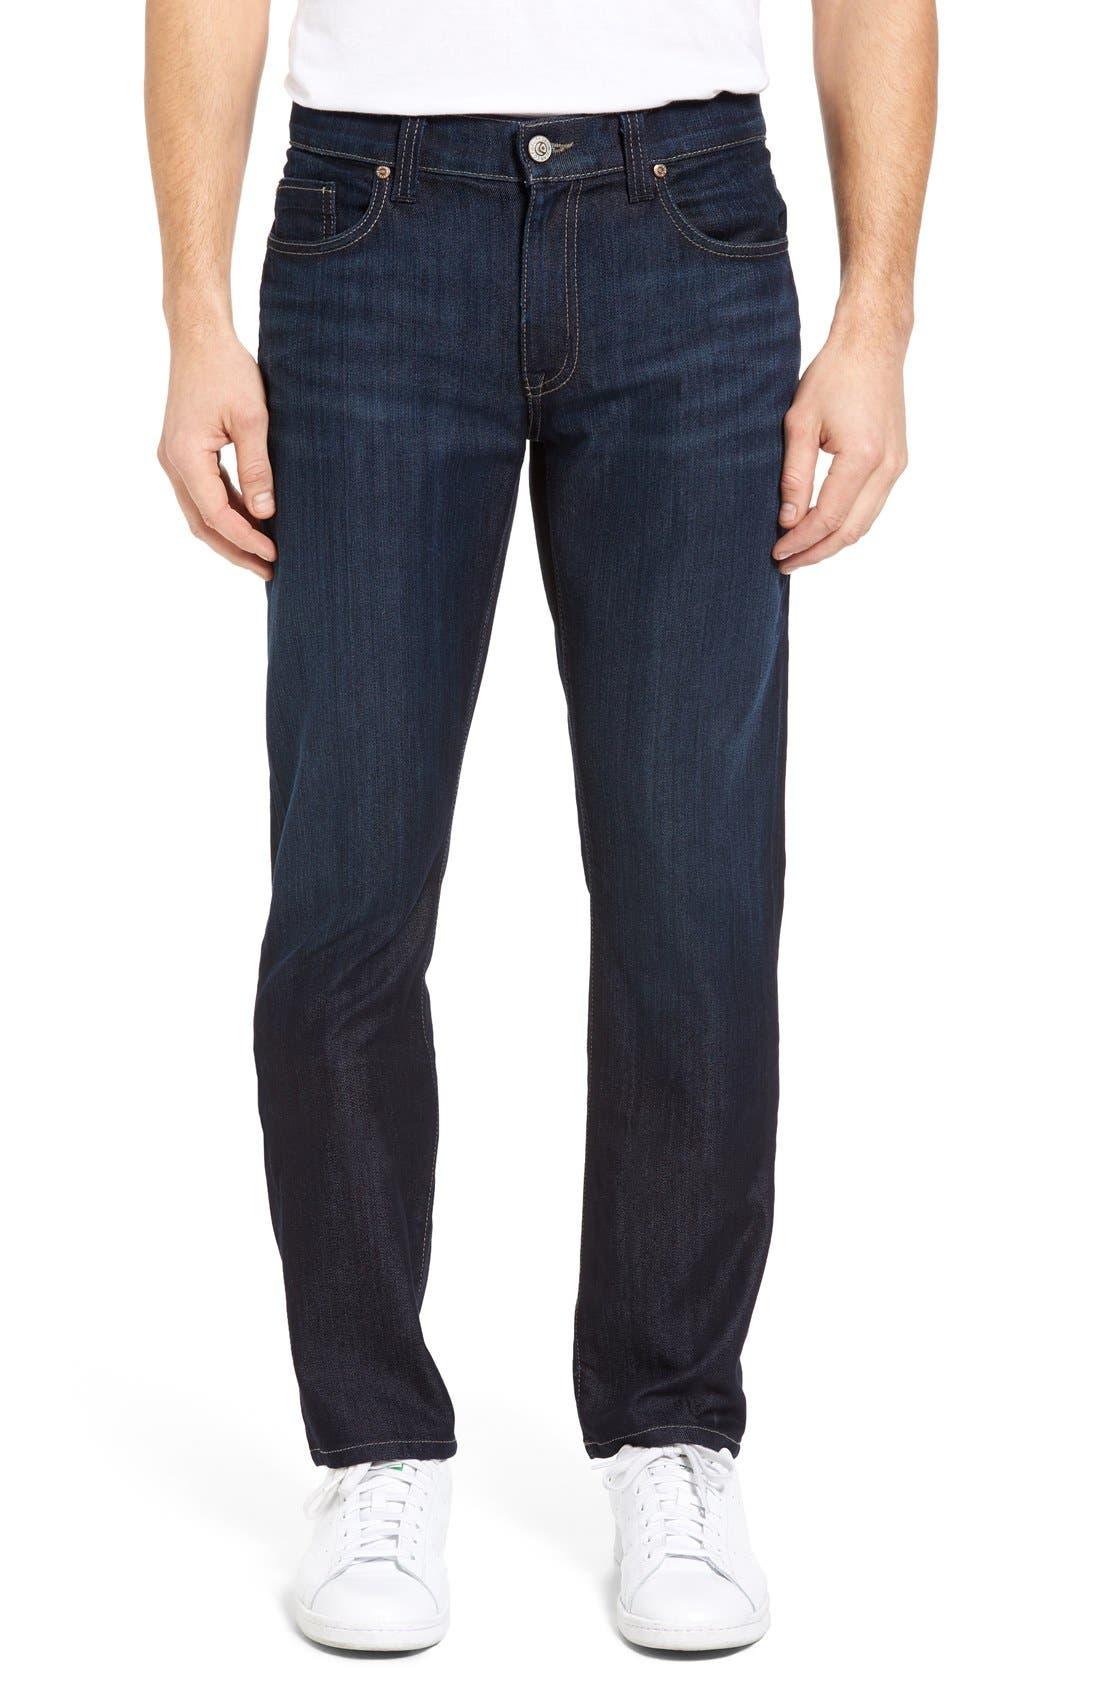 FIDELITY DENIM Impala Straight Leg Jeans